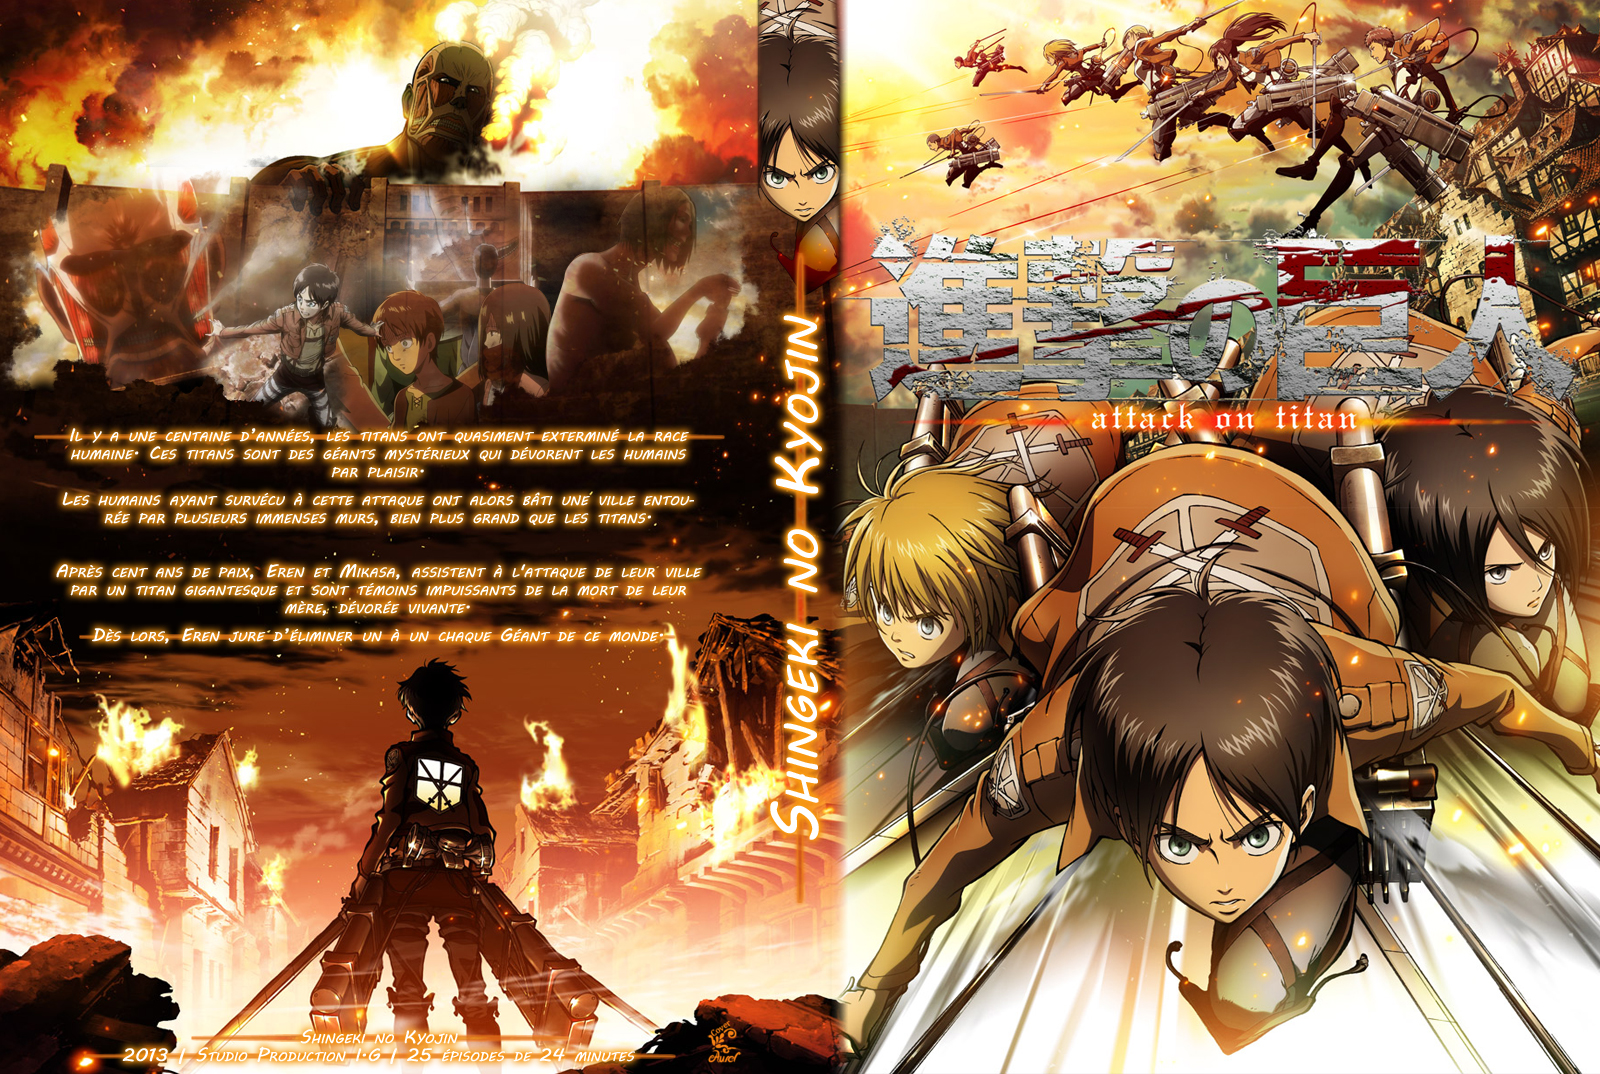 Attack on Titan – Season (1-3) Full 1080p 720p 480p WebRip Download With Subtitles